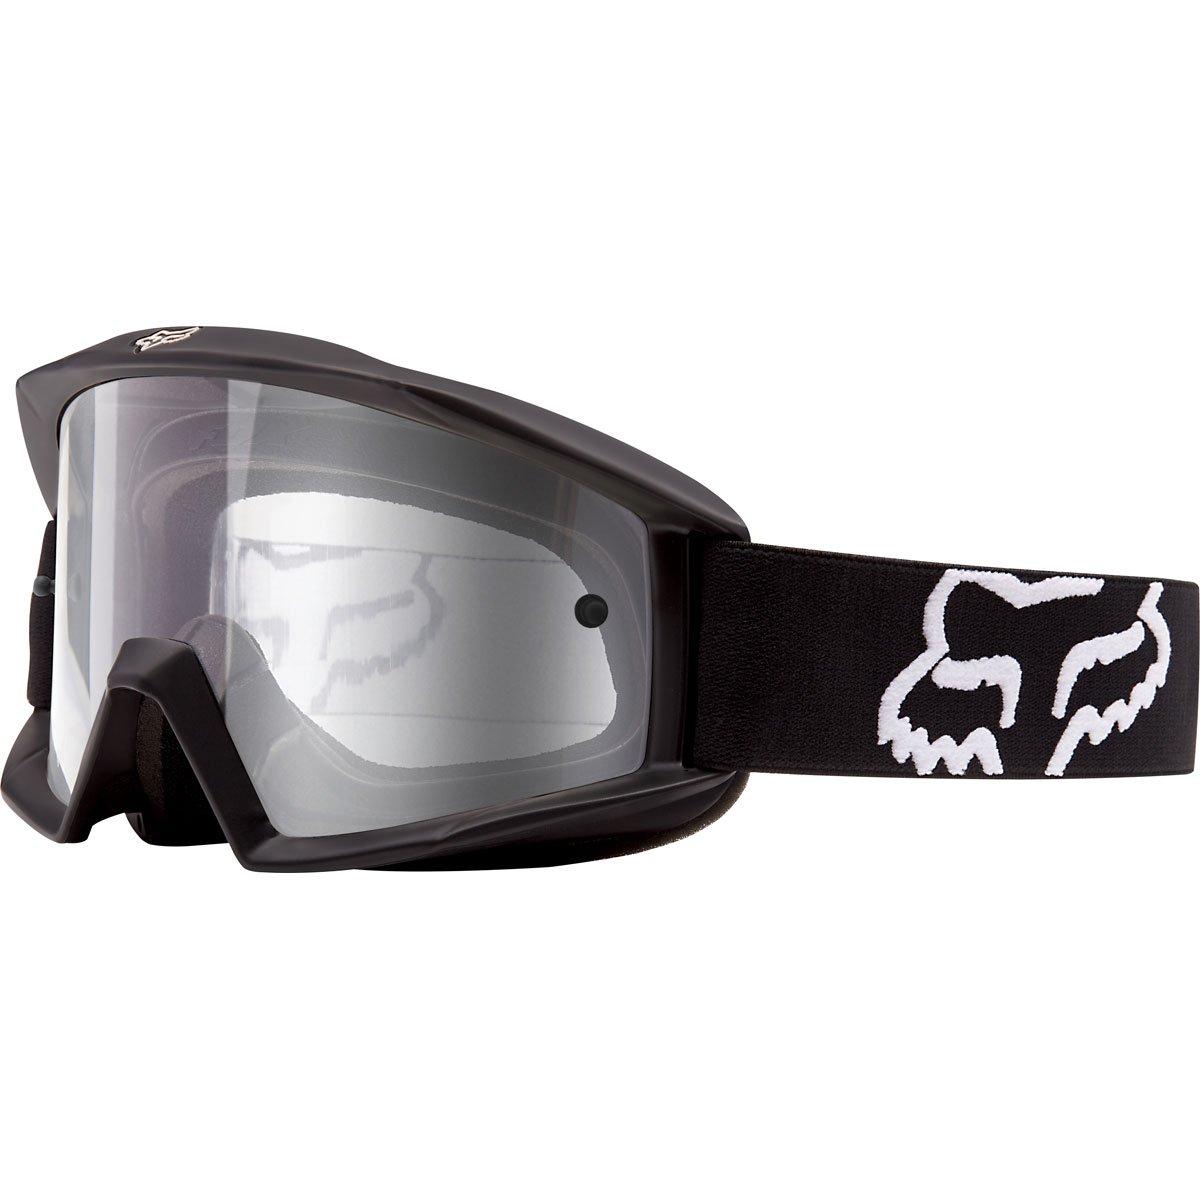 Fox Racing Main Adult Moto Motorcycle Goggles Eyewear - Black/One Size